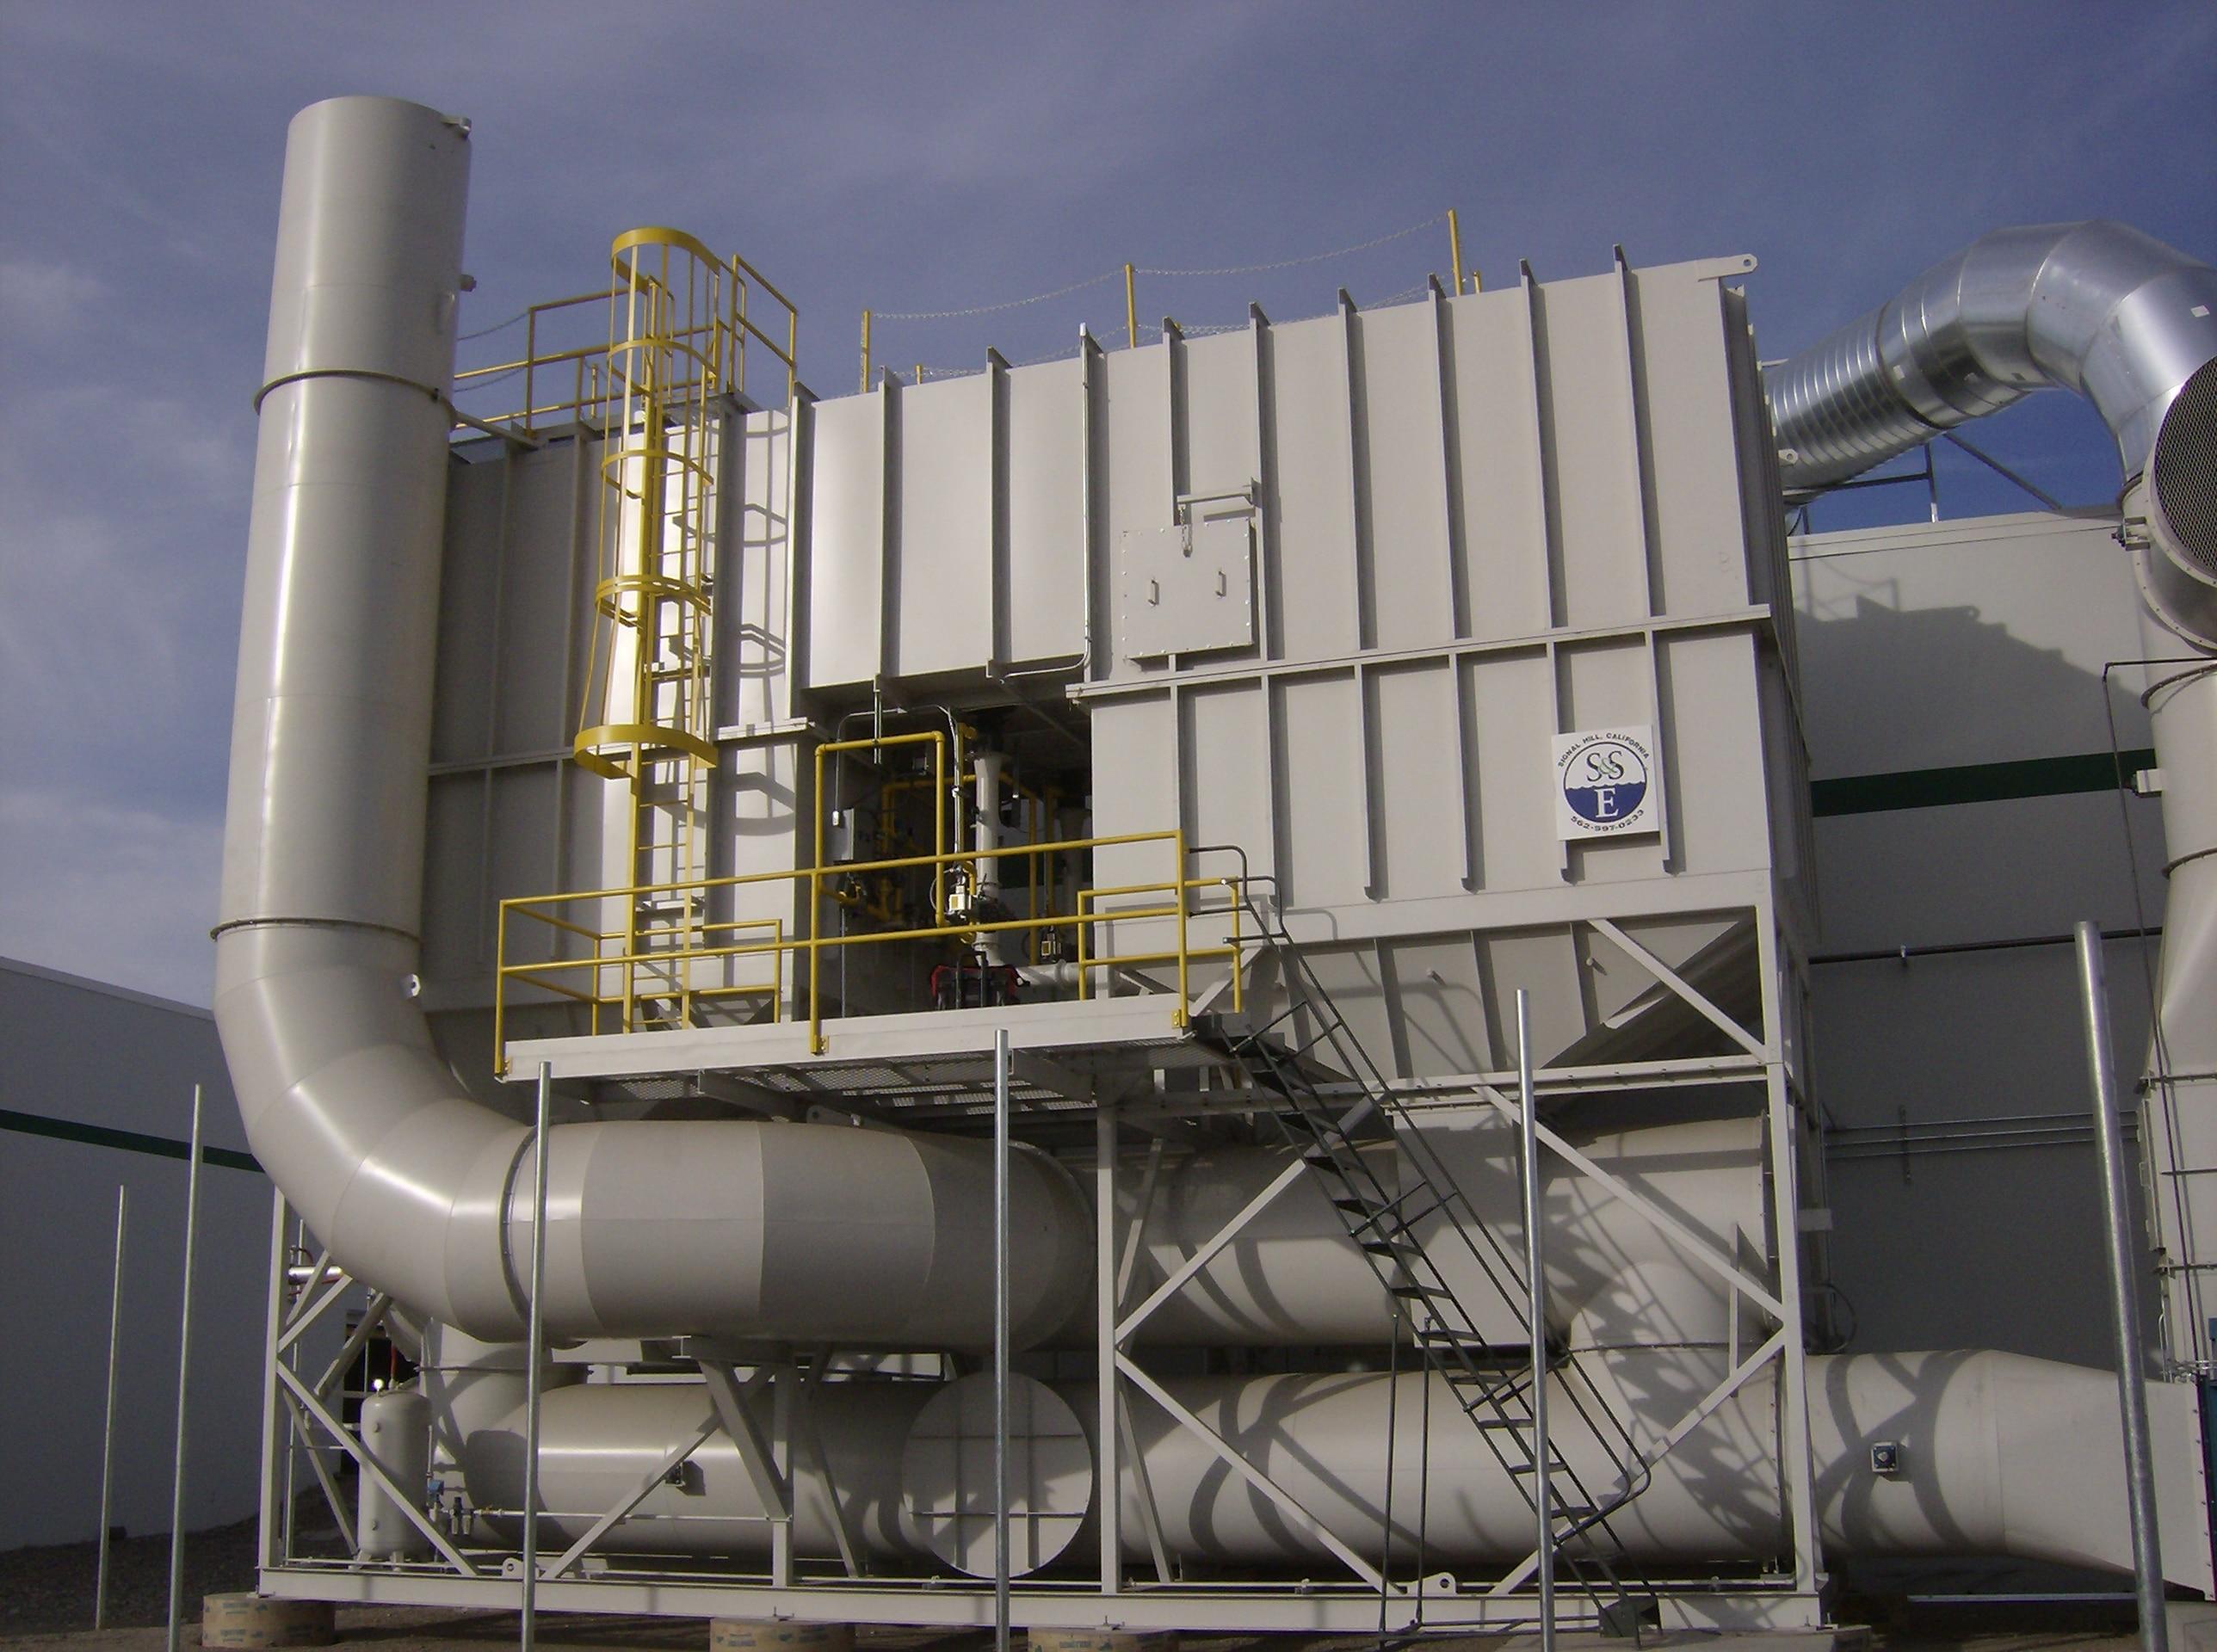 Regenerative Thermal Oxidizer - 40,000 SCFM